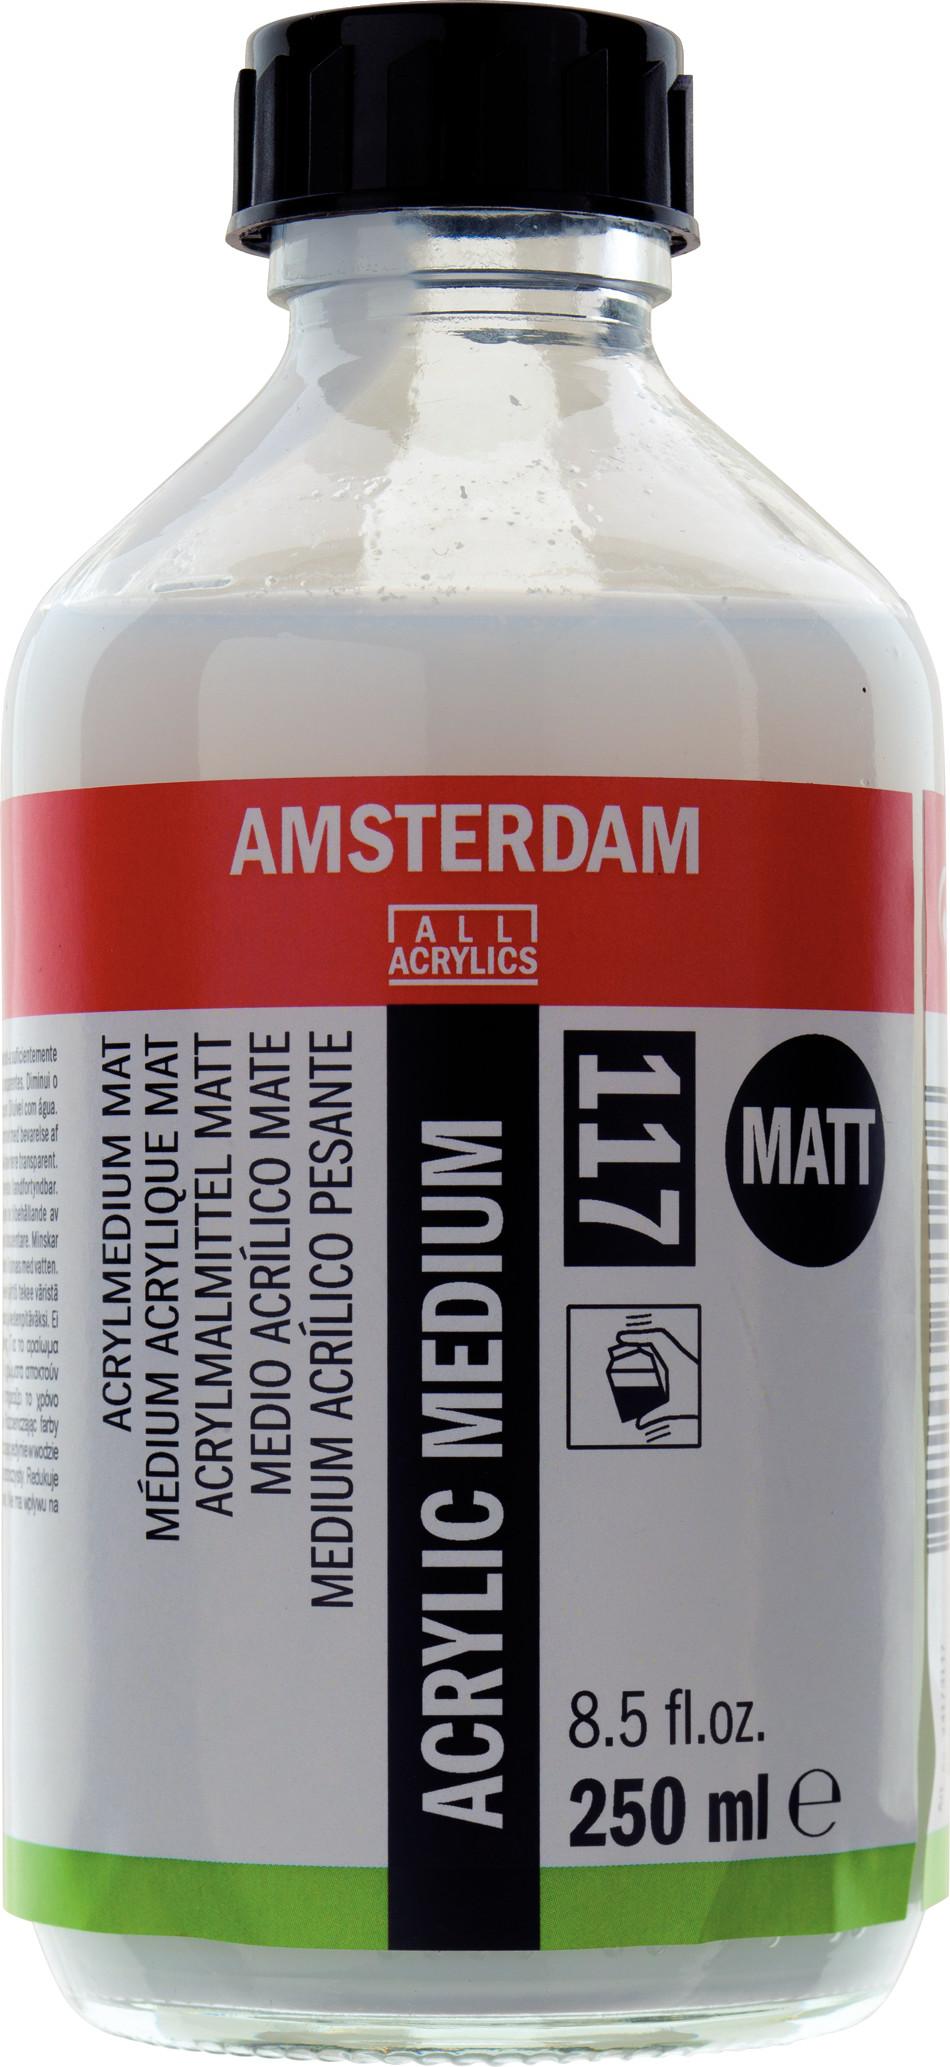 Amsterdam Acrylic Medium Matt Bottle 250 ml